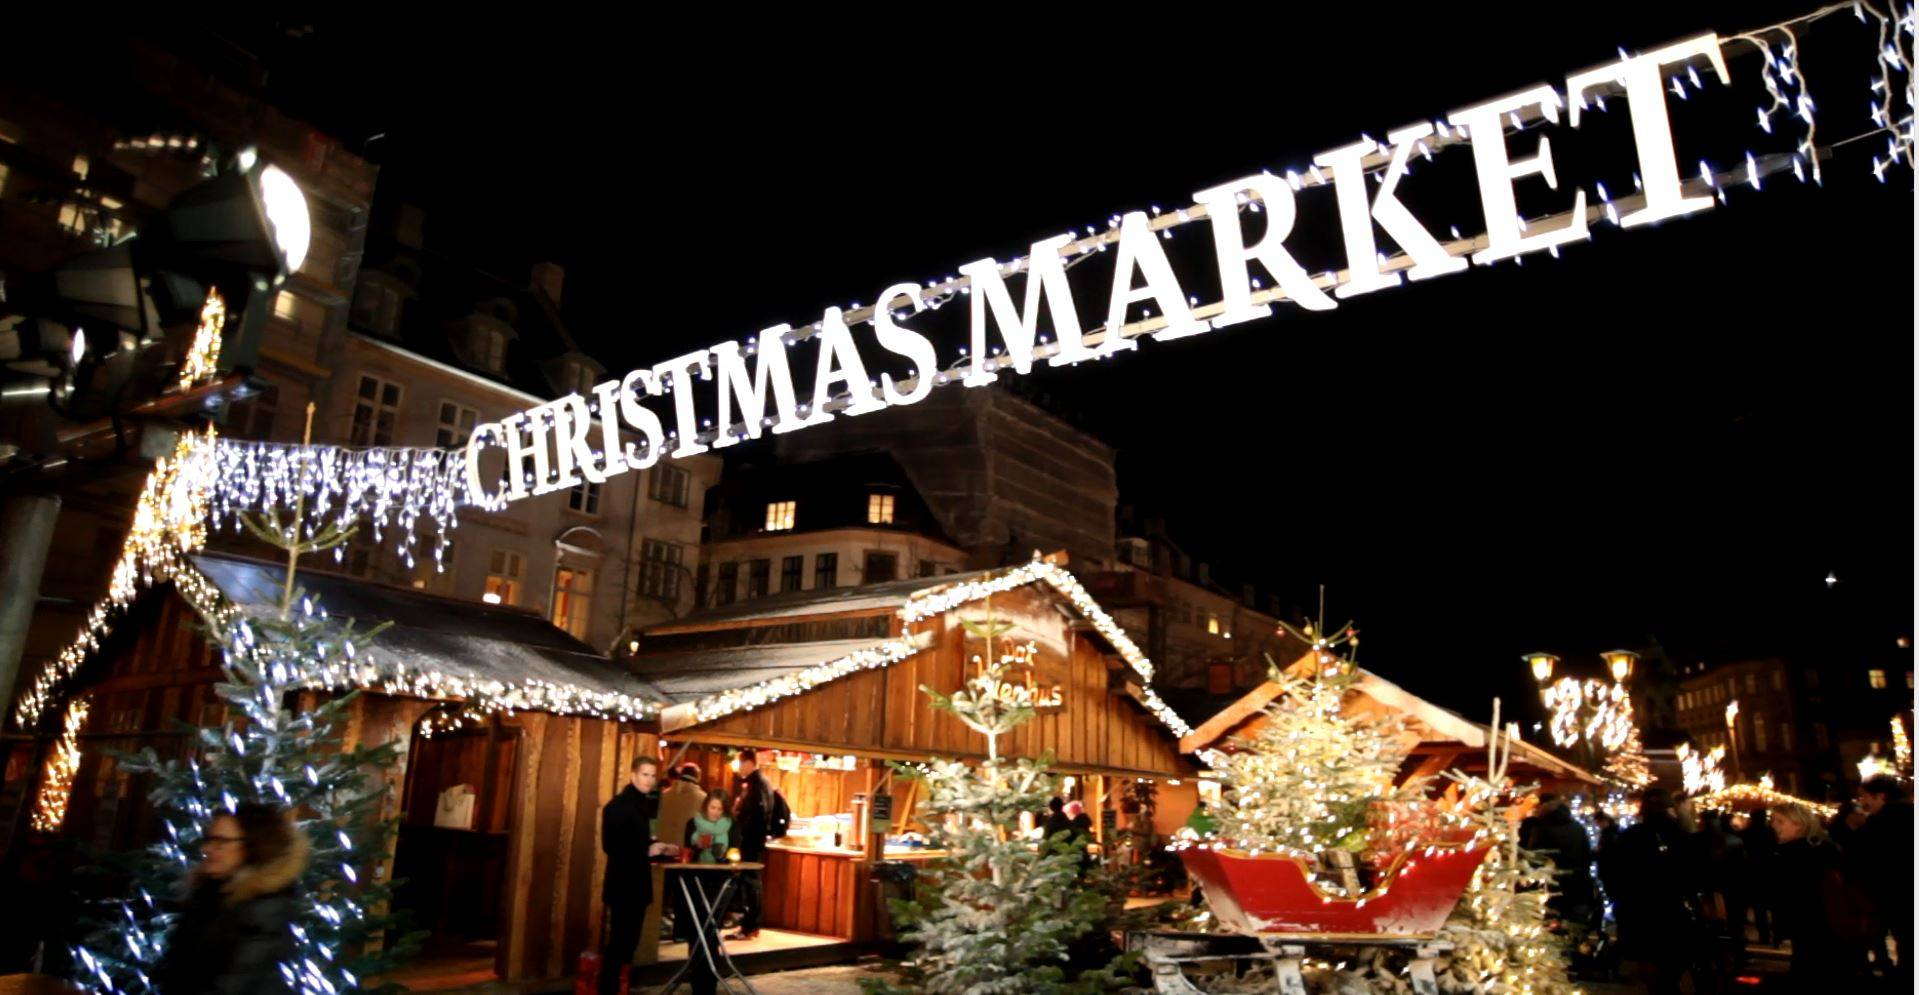 Christmas Market Shanghai 2020 Kristkindel Market!   Winery at Versailles